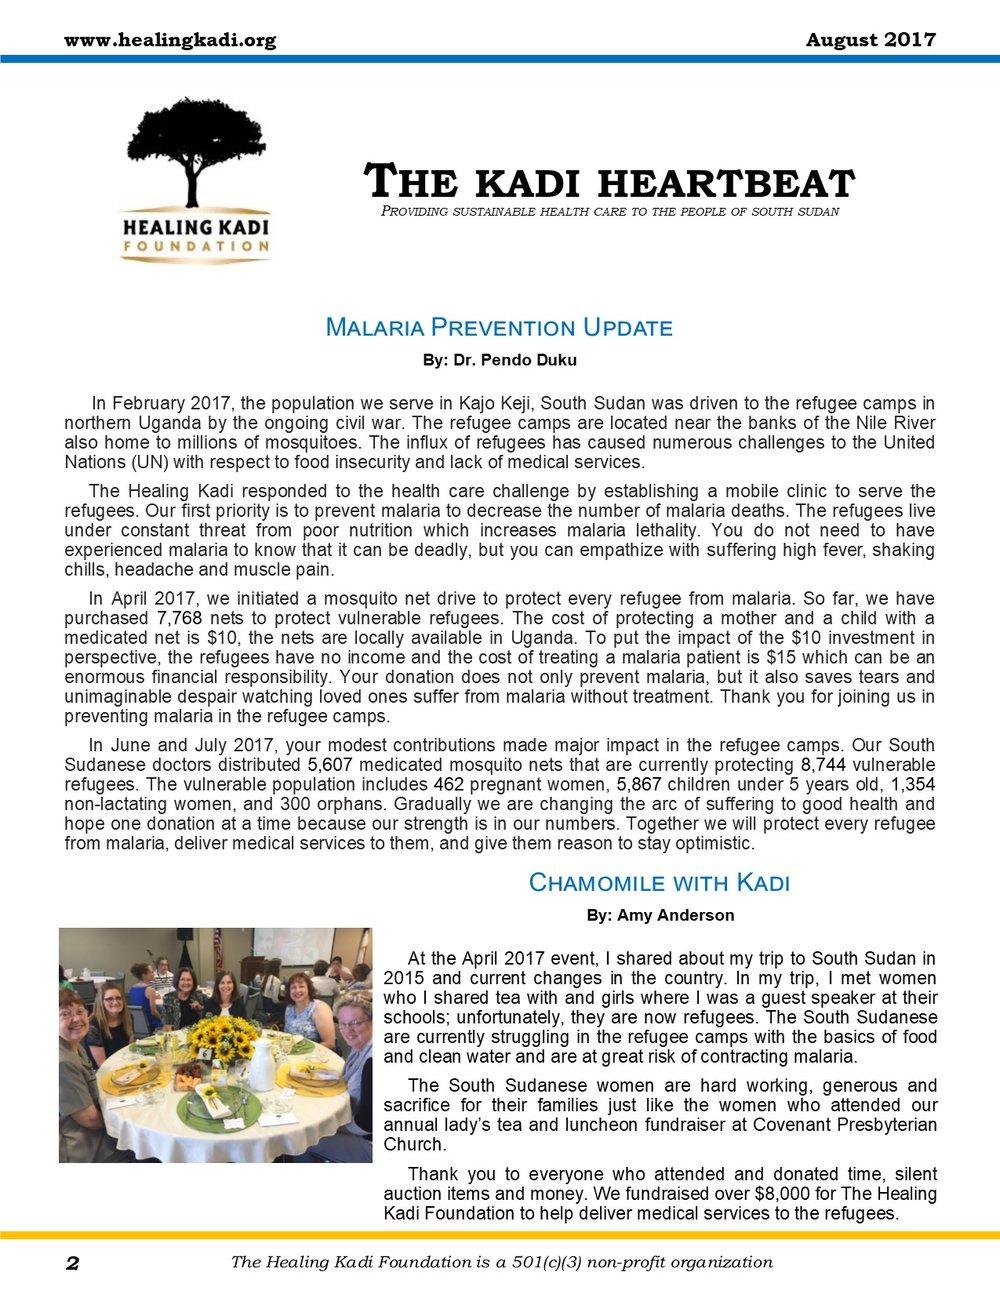 The Kadi Beat_August_6_2017-p2.jpg